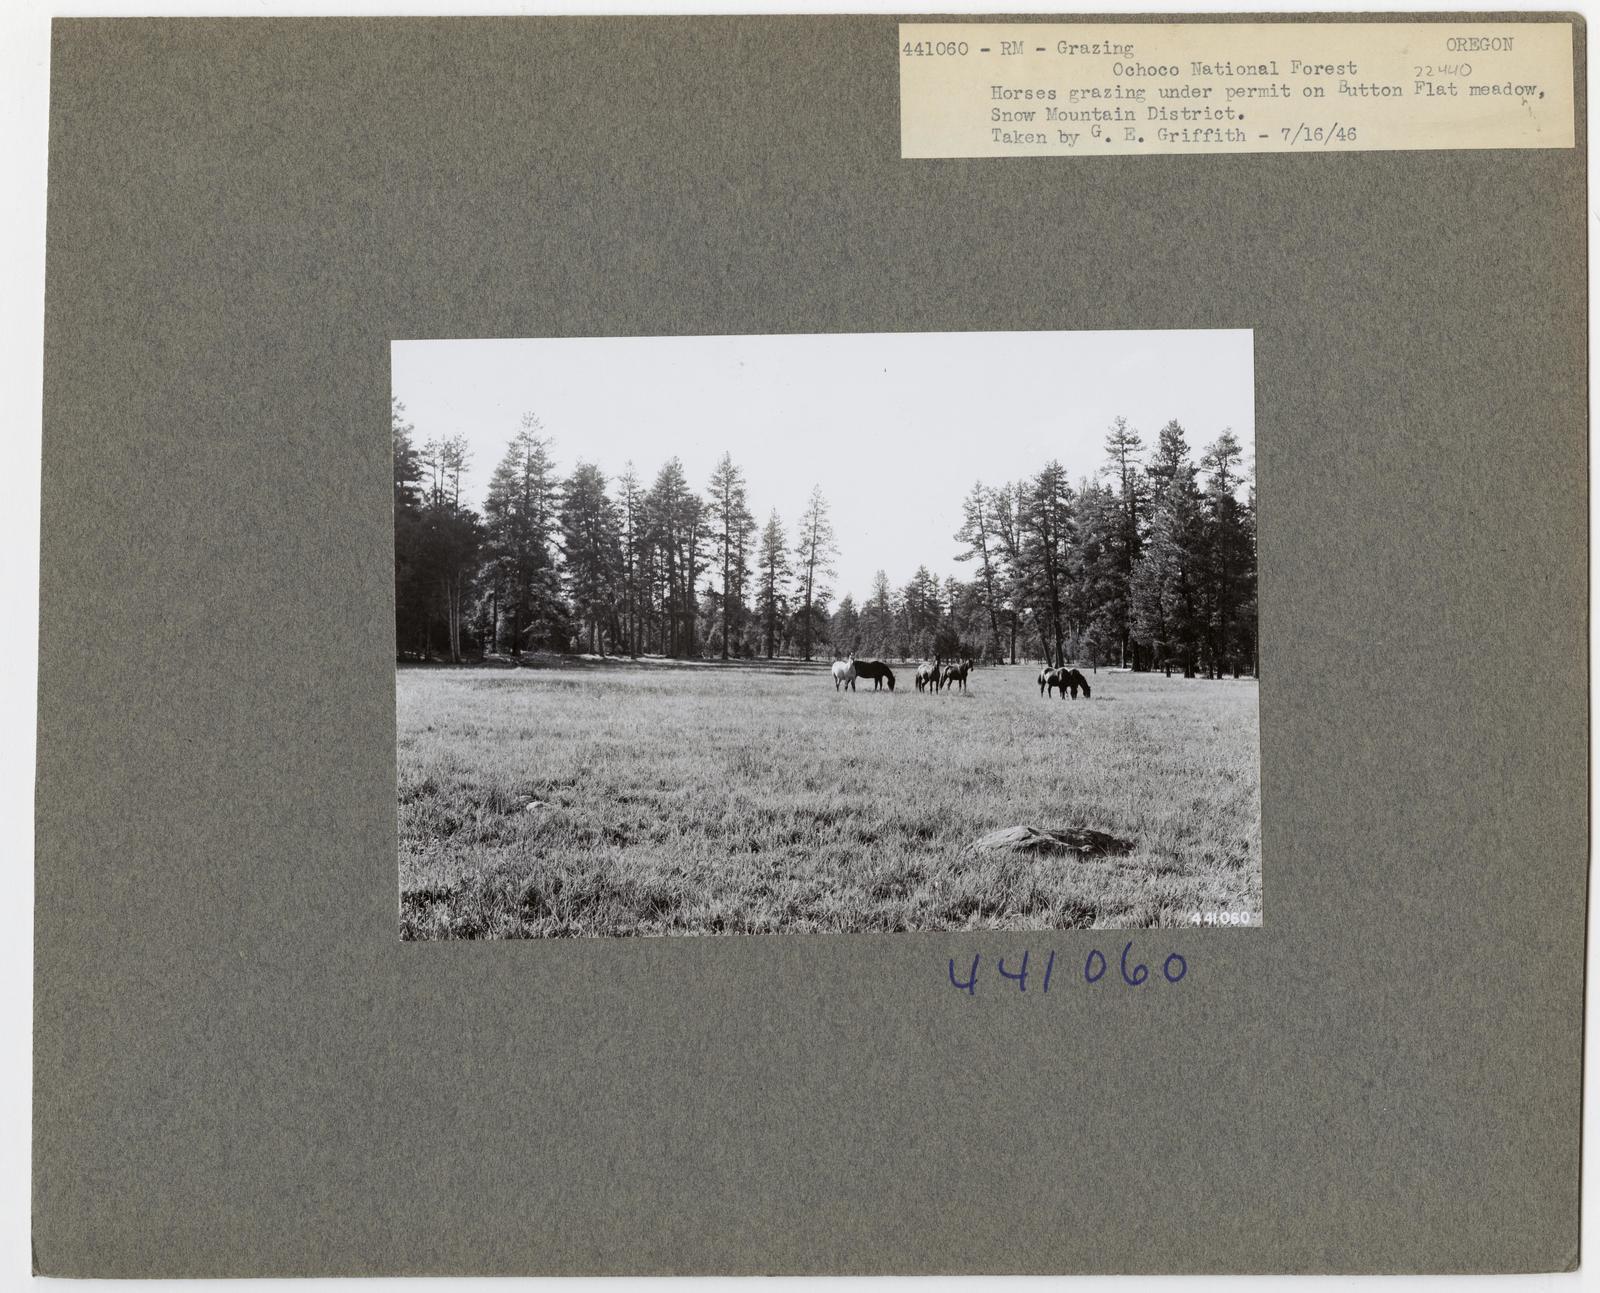 Cattle Grazing - Oregon